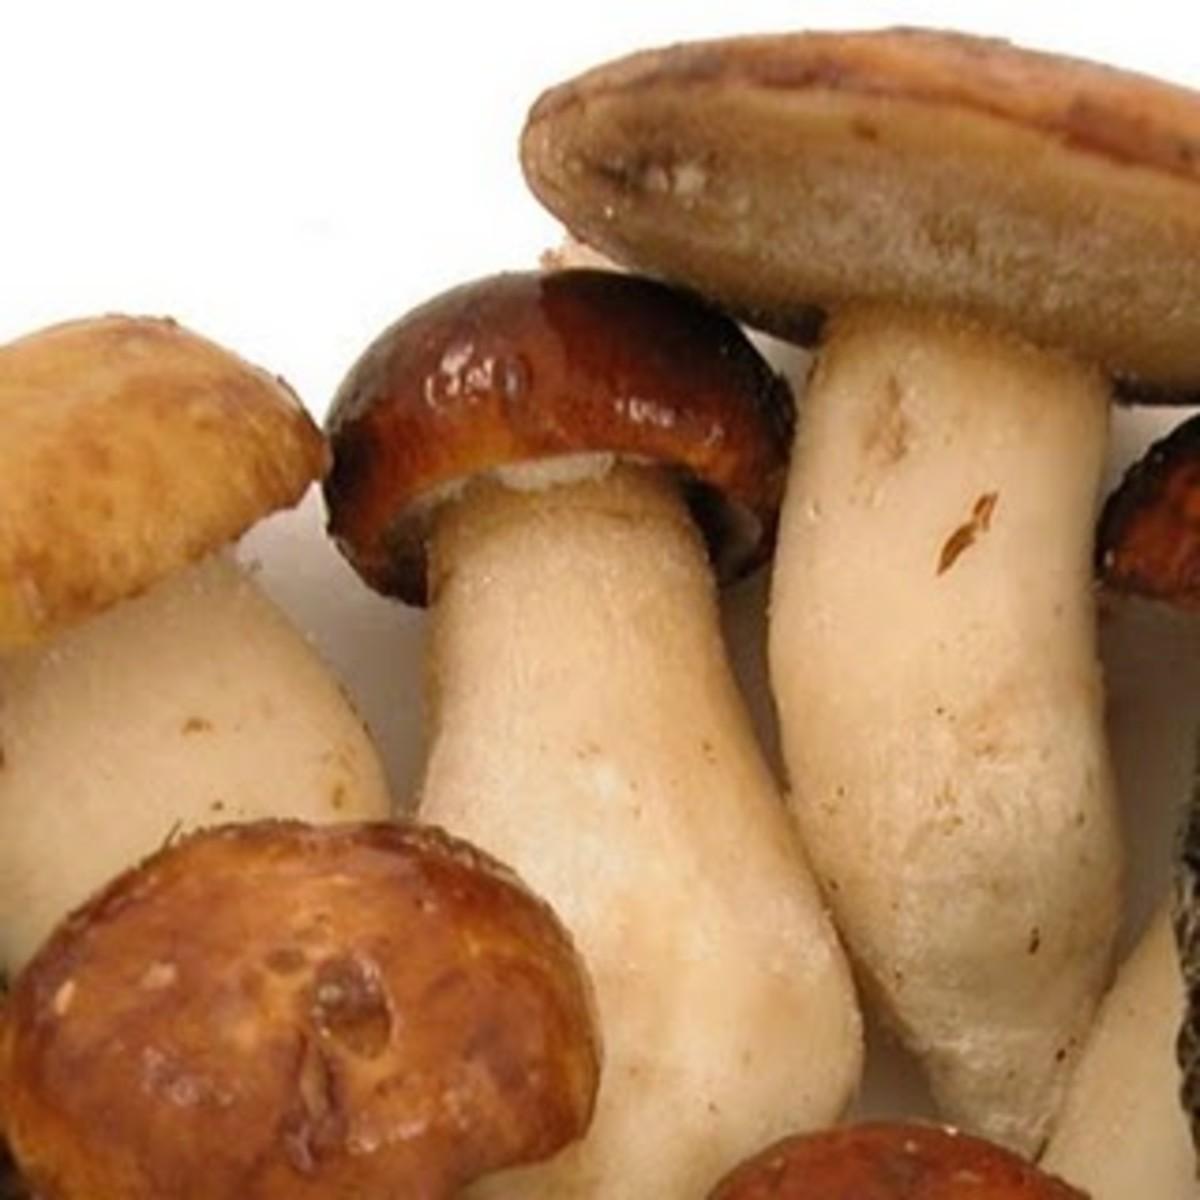 Porcini / penny bun mushrooms